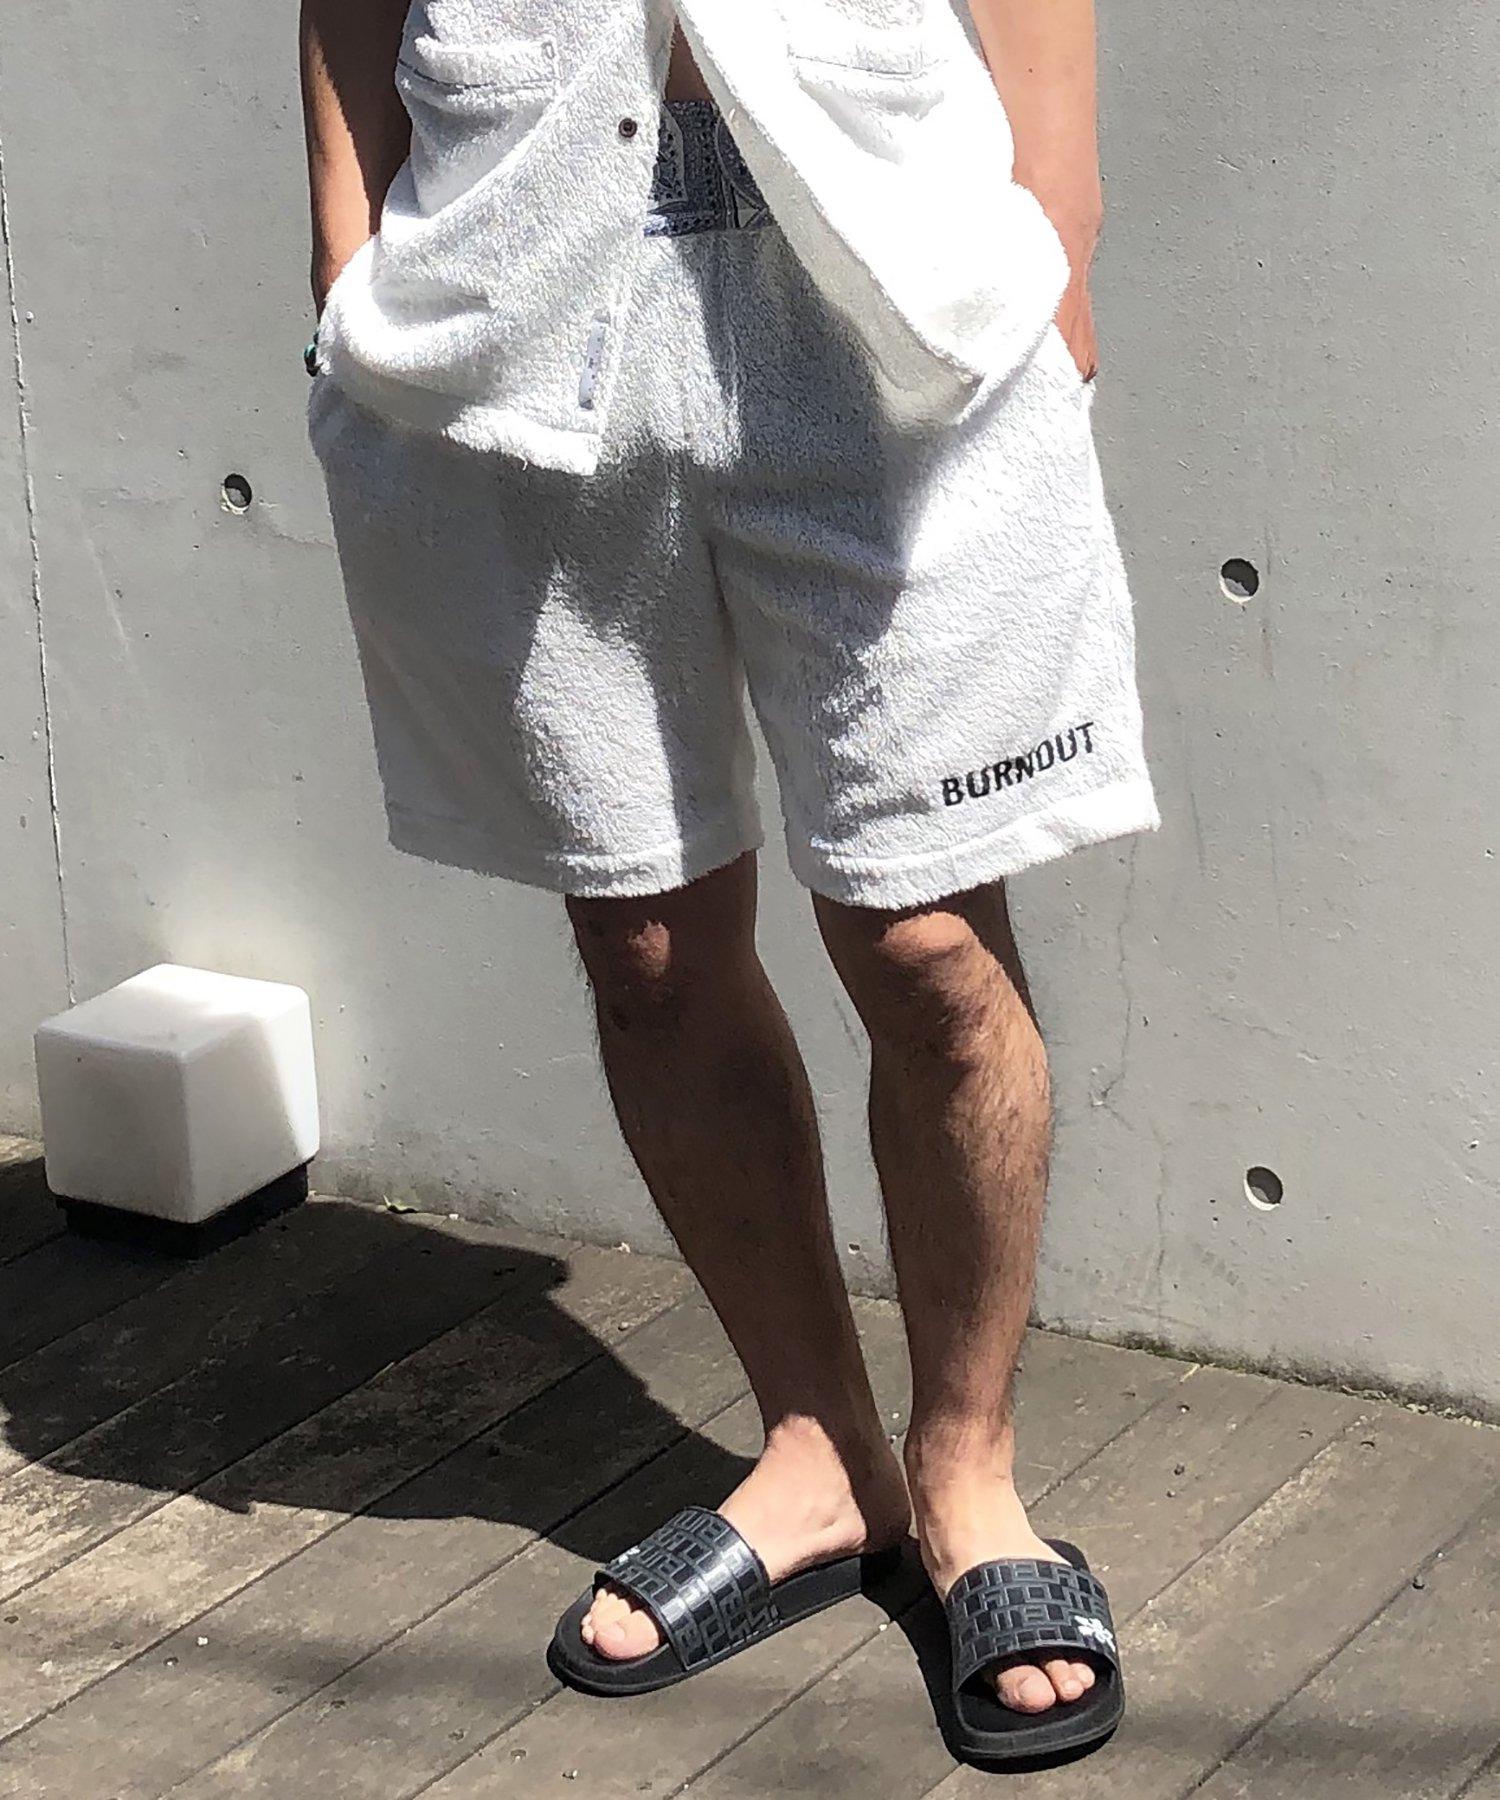 Burnout〔バーンアウト〕 『21' early summer collection』 ボクサーショートパンツ(White)